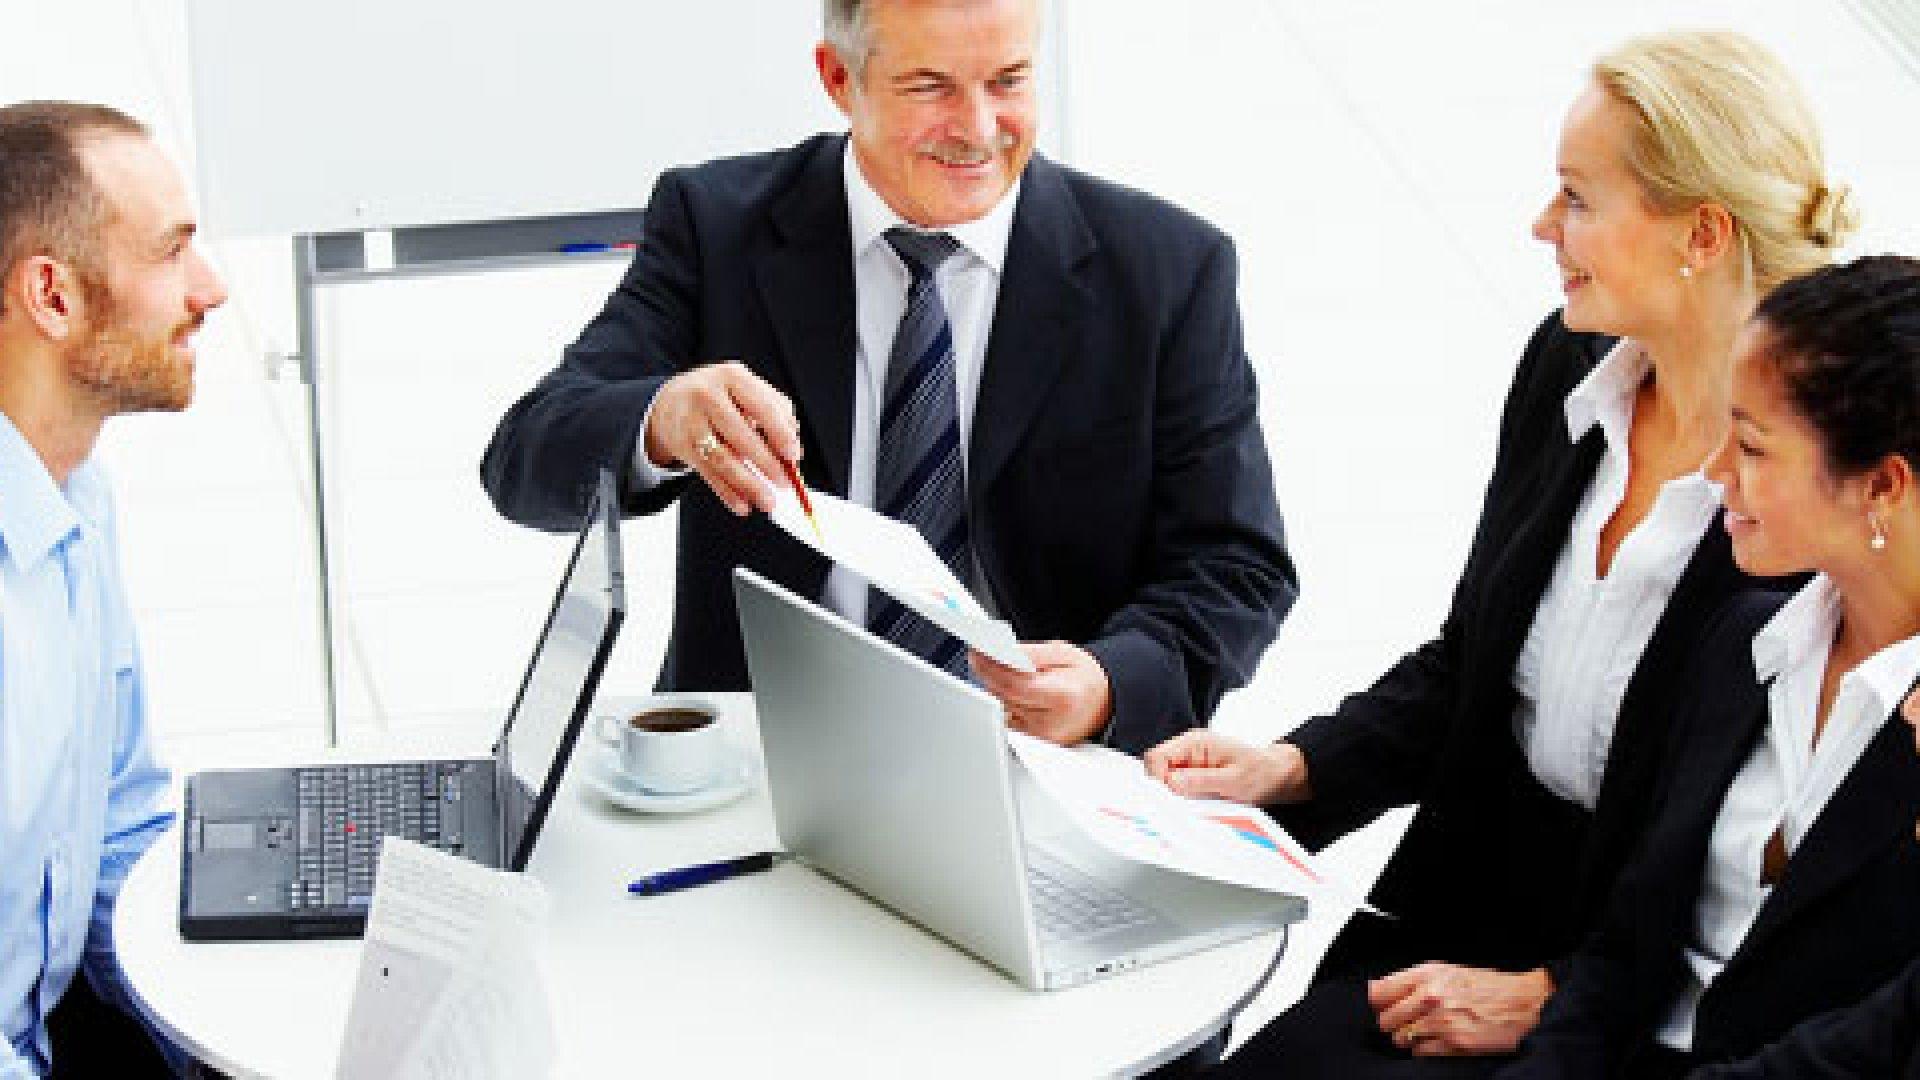 Meetings Suck? Make Them Better